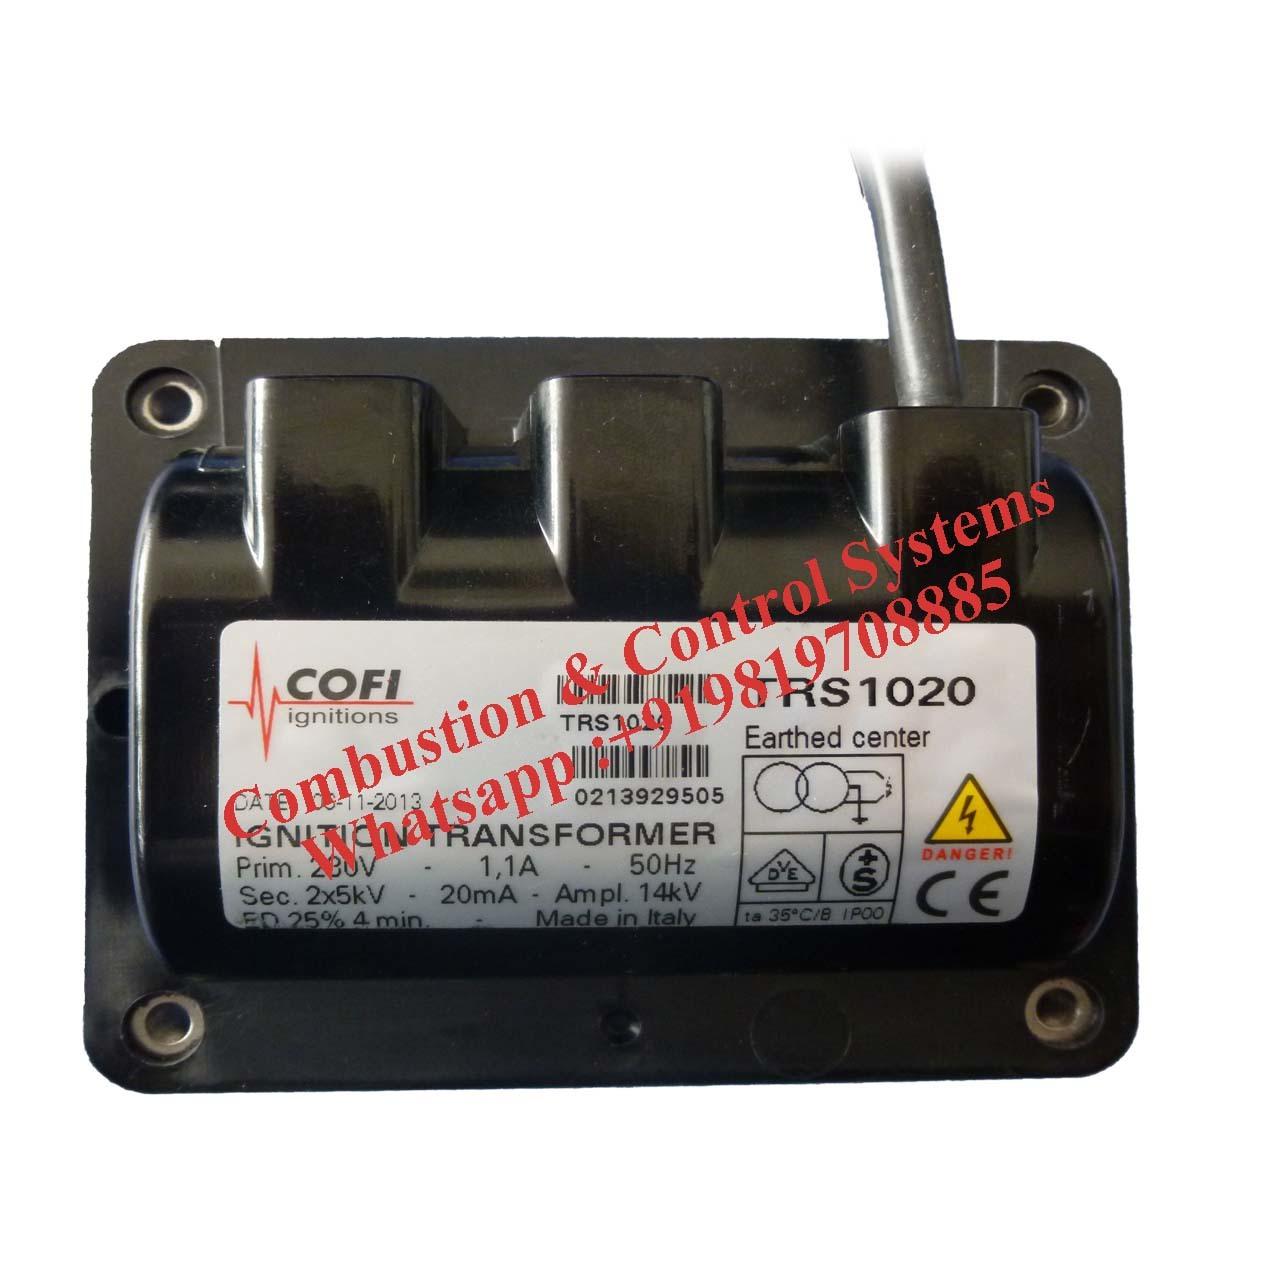 Cofi TRS1020 ignition transformer